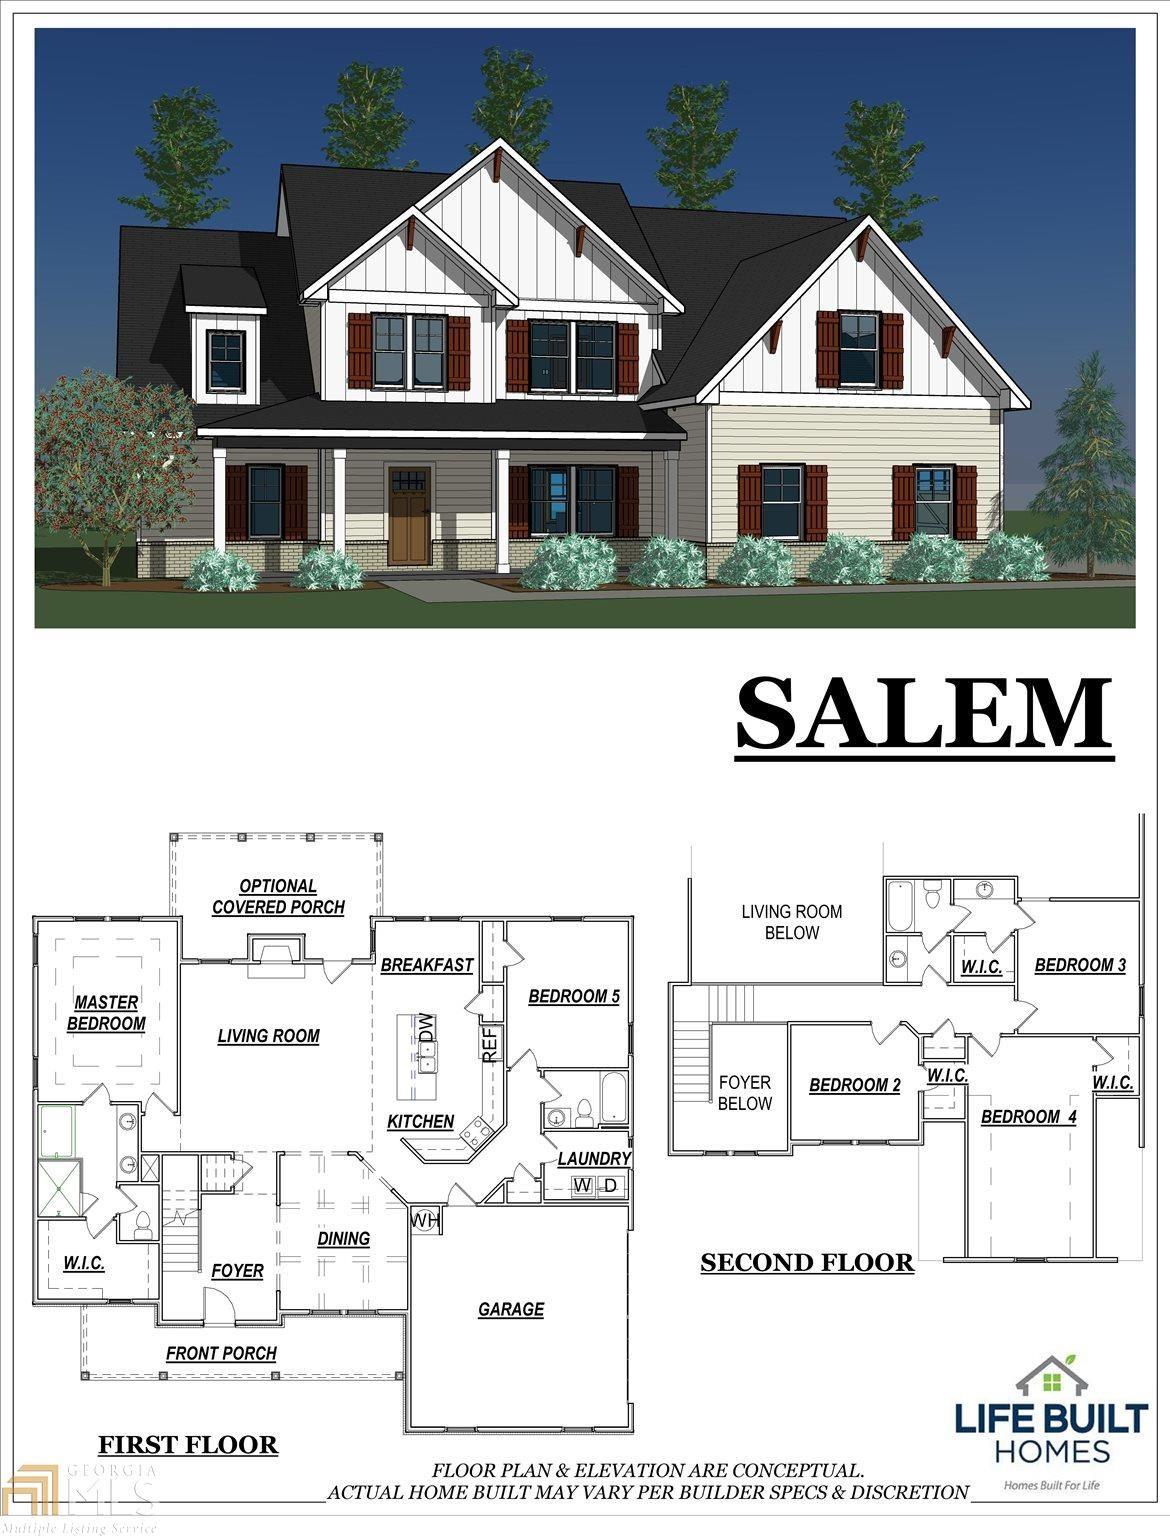 285 N Unity Grove Rd, Locust Grove, GA 30248 - MLS#: 8825099